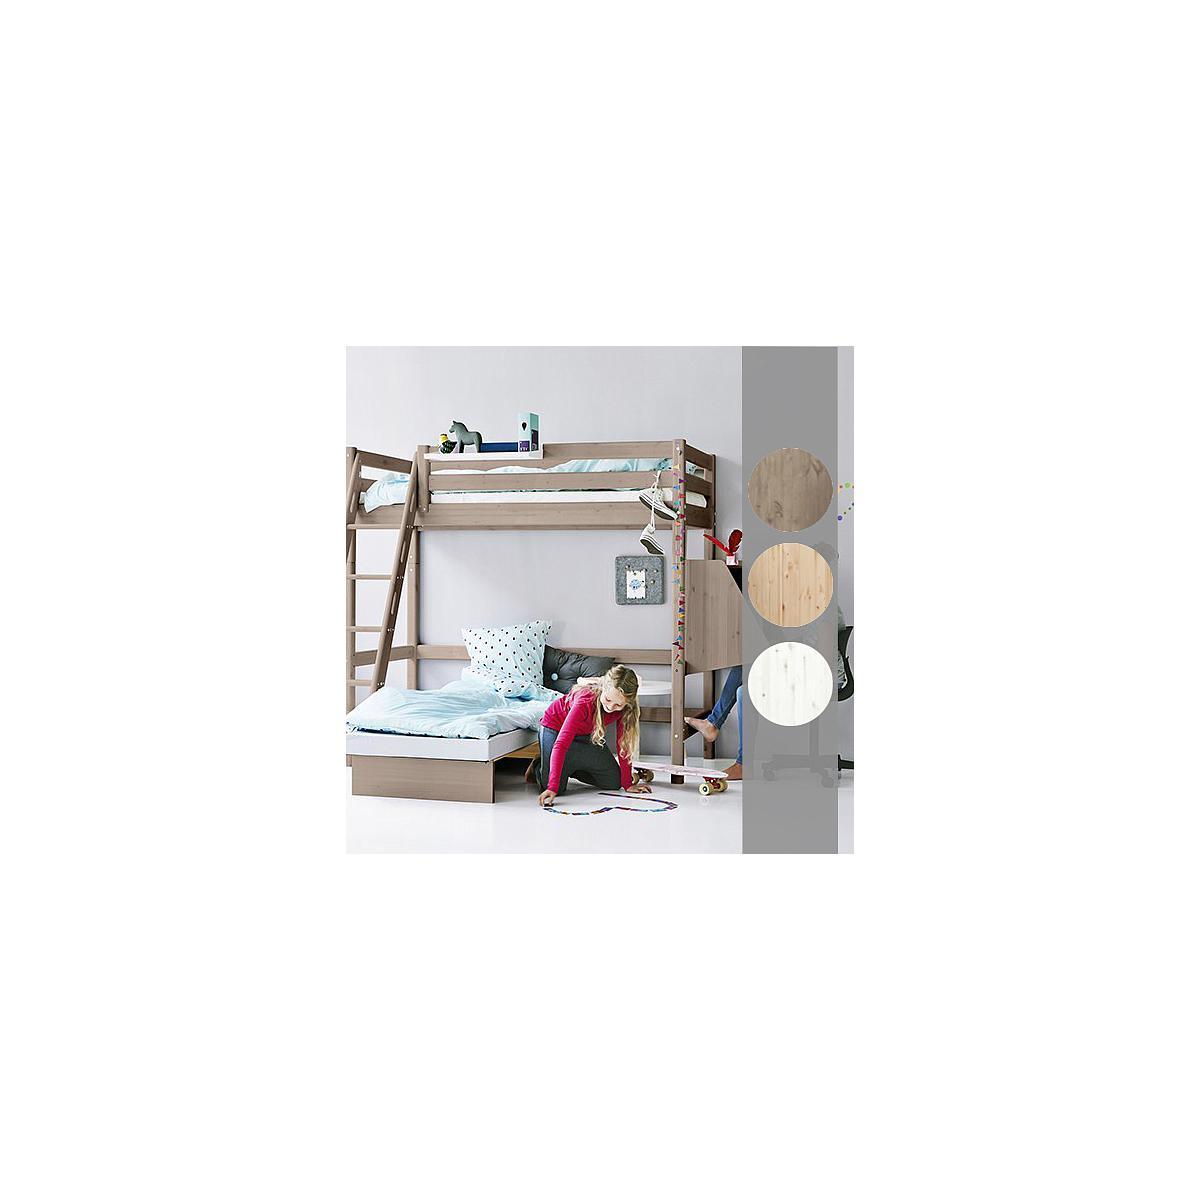 Sofa-cama Cama casa alta CLASSIC Flexa terra